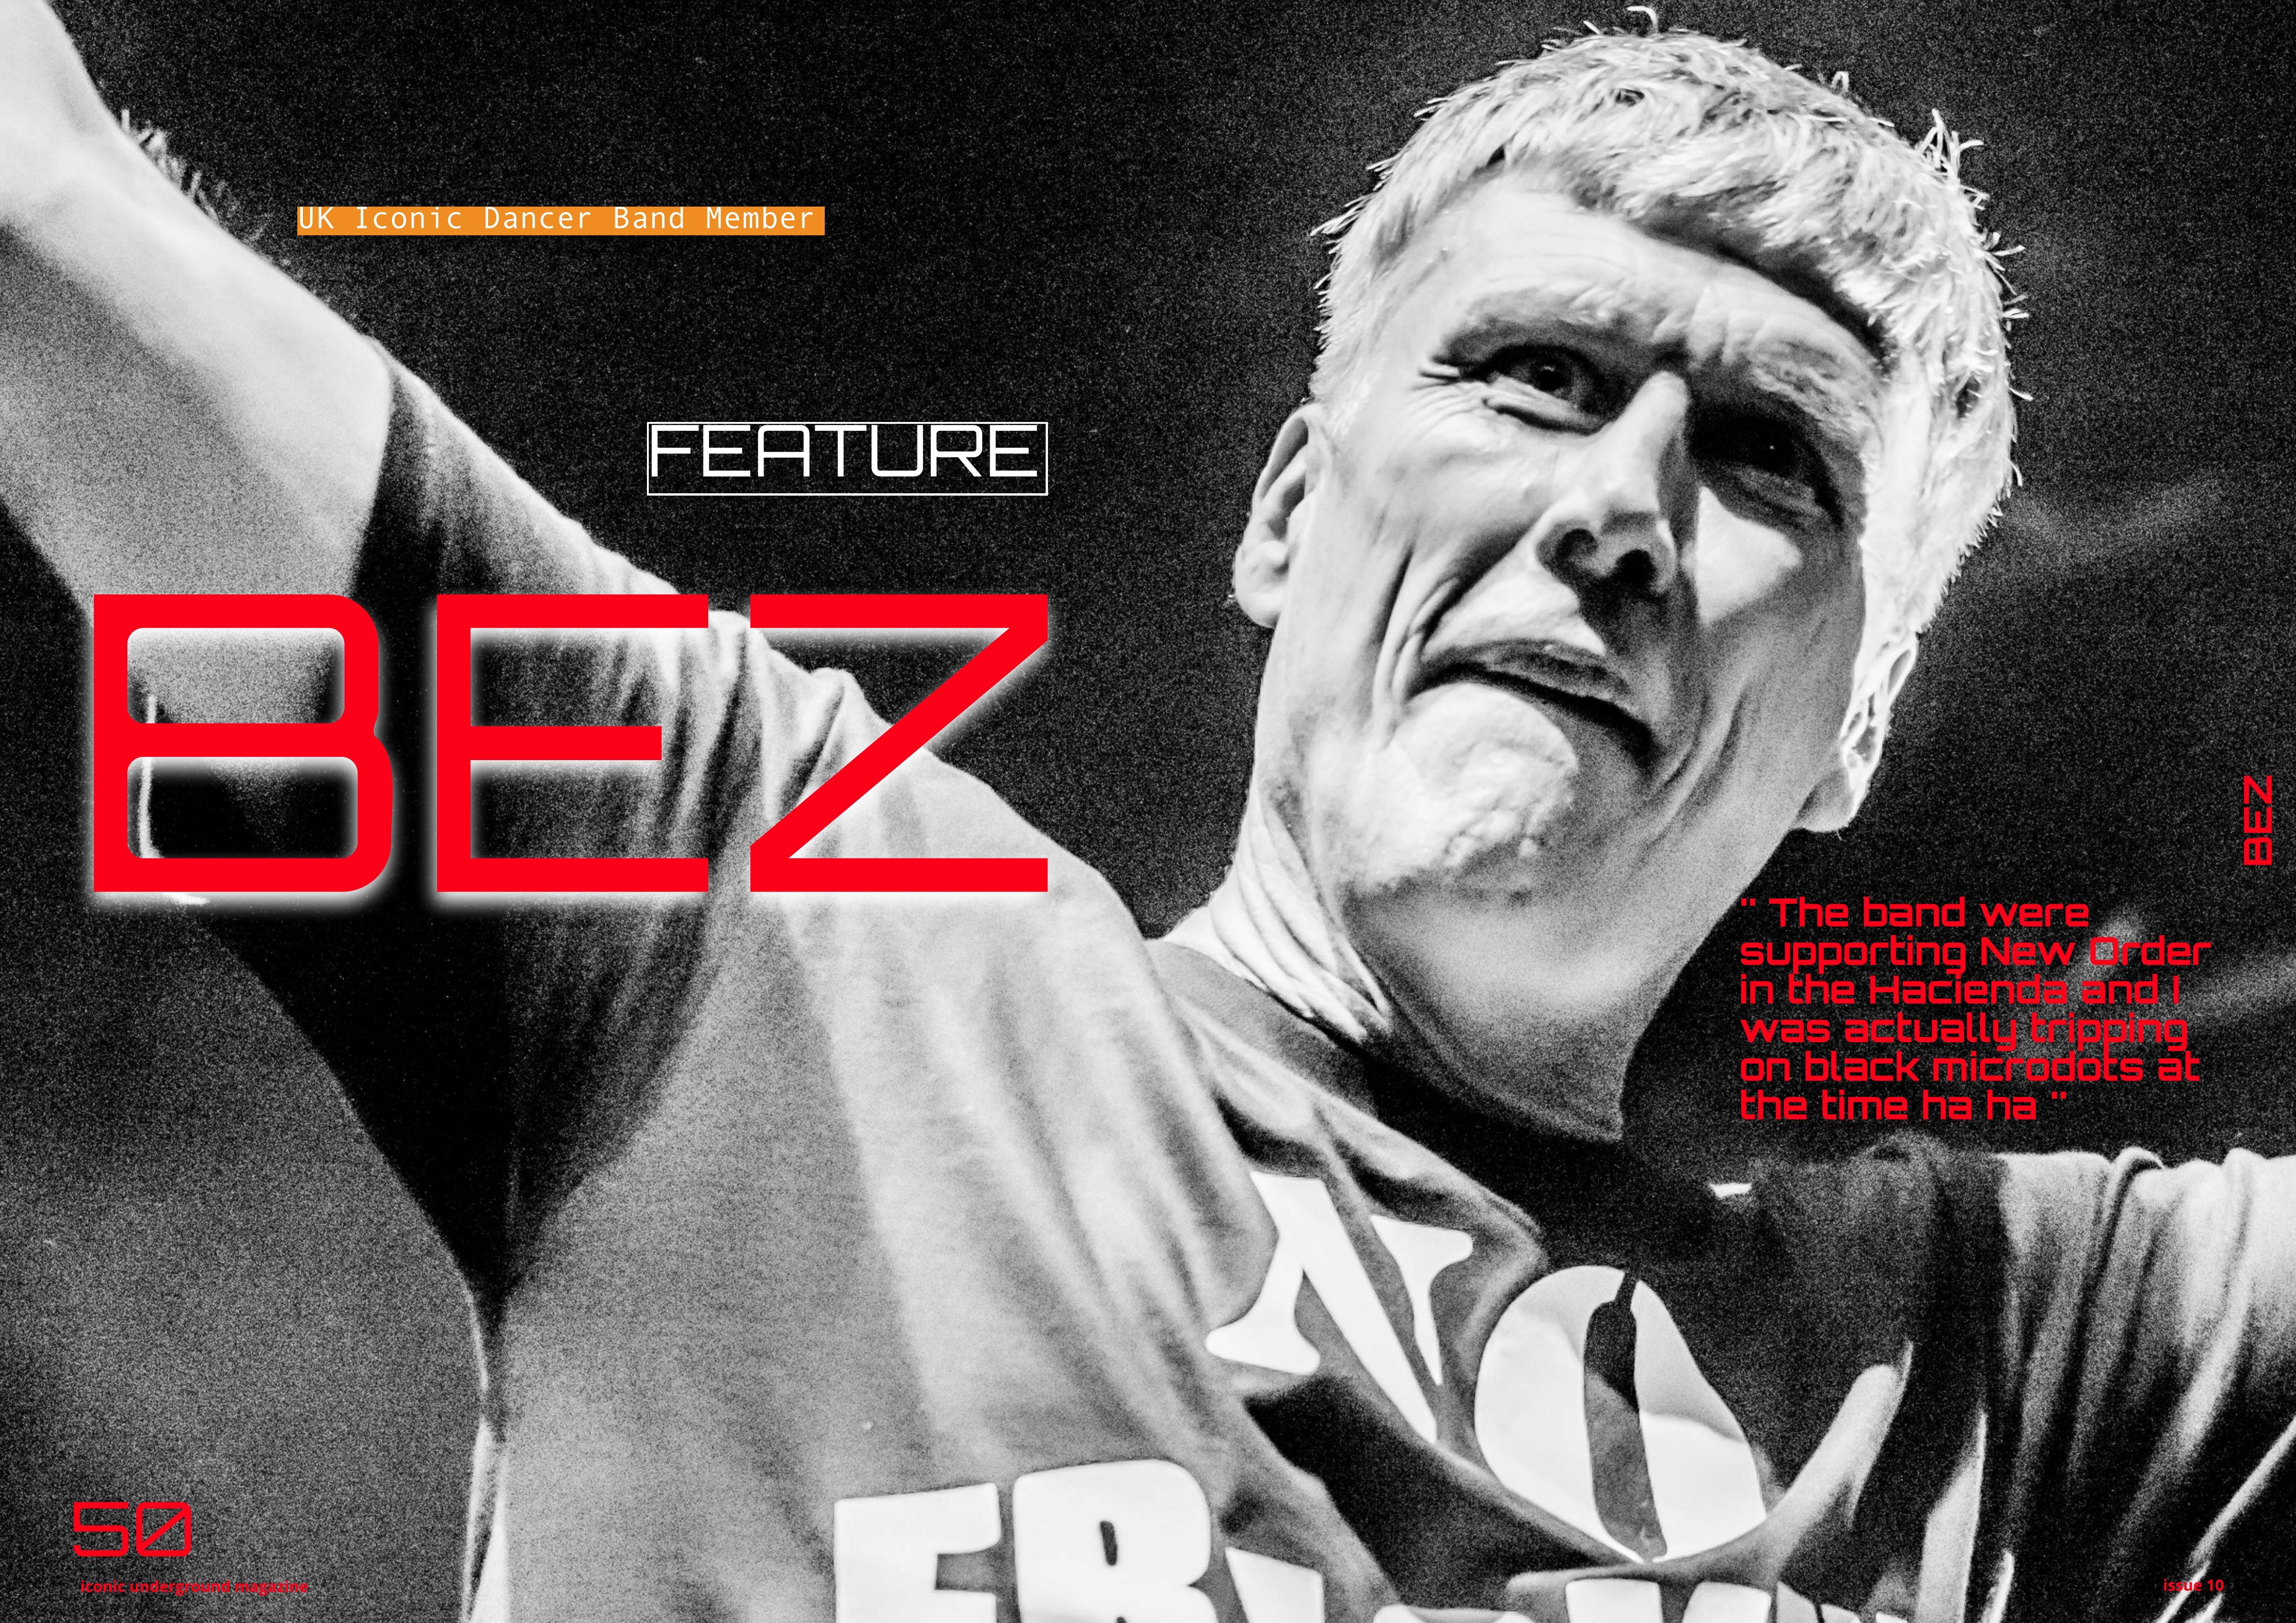 BEZ HAPPY MONDAYS – EXCLUSIVE INTERVIEW